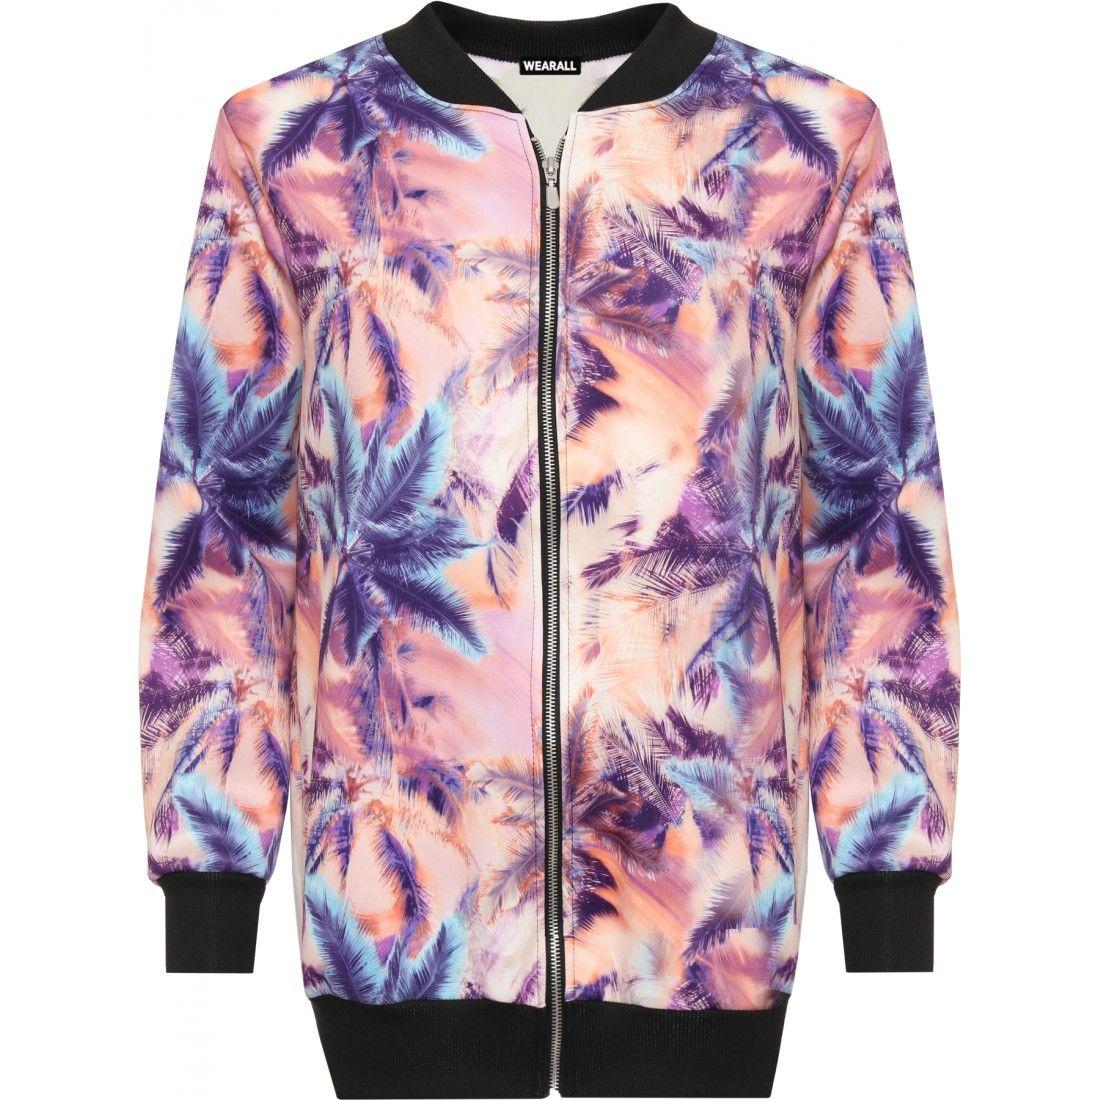 WearAll Womens Plus Floral Bomber Jacket Ladies Top Rose Print Long Sleeve Zip Stretch 14-28